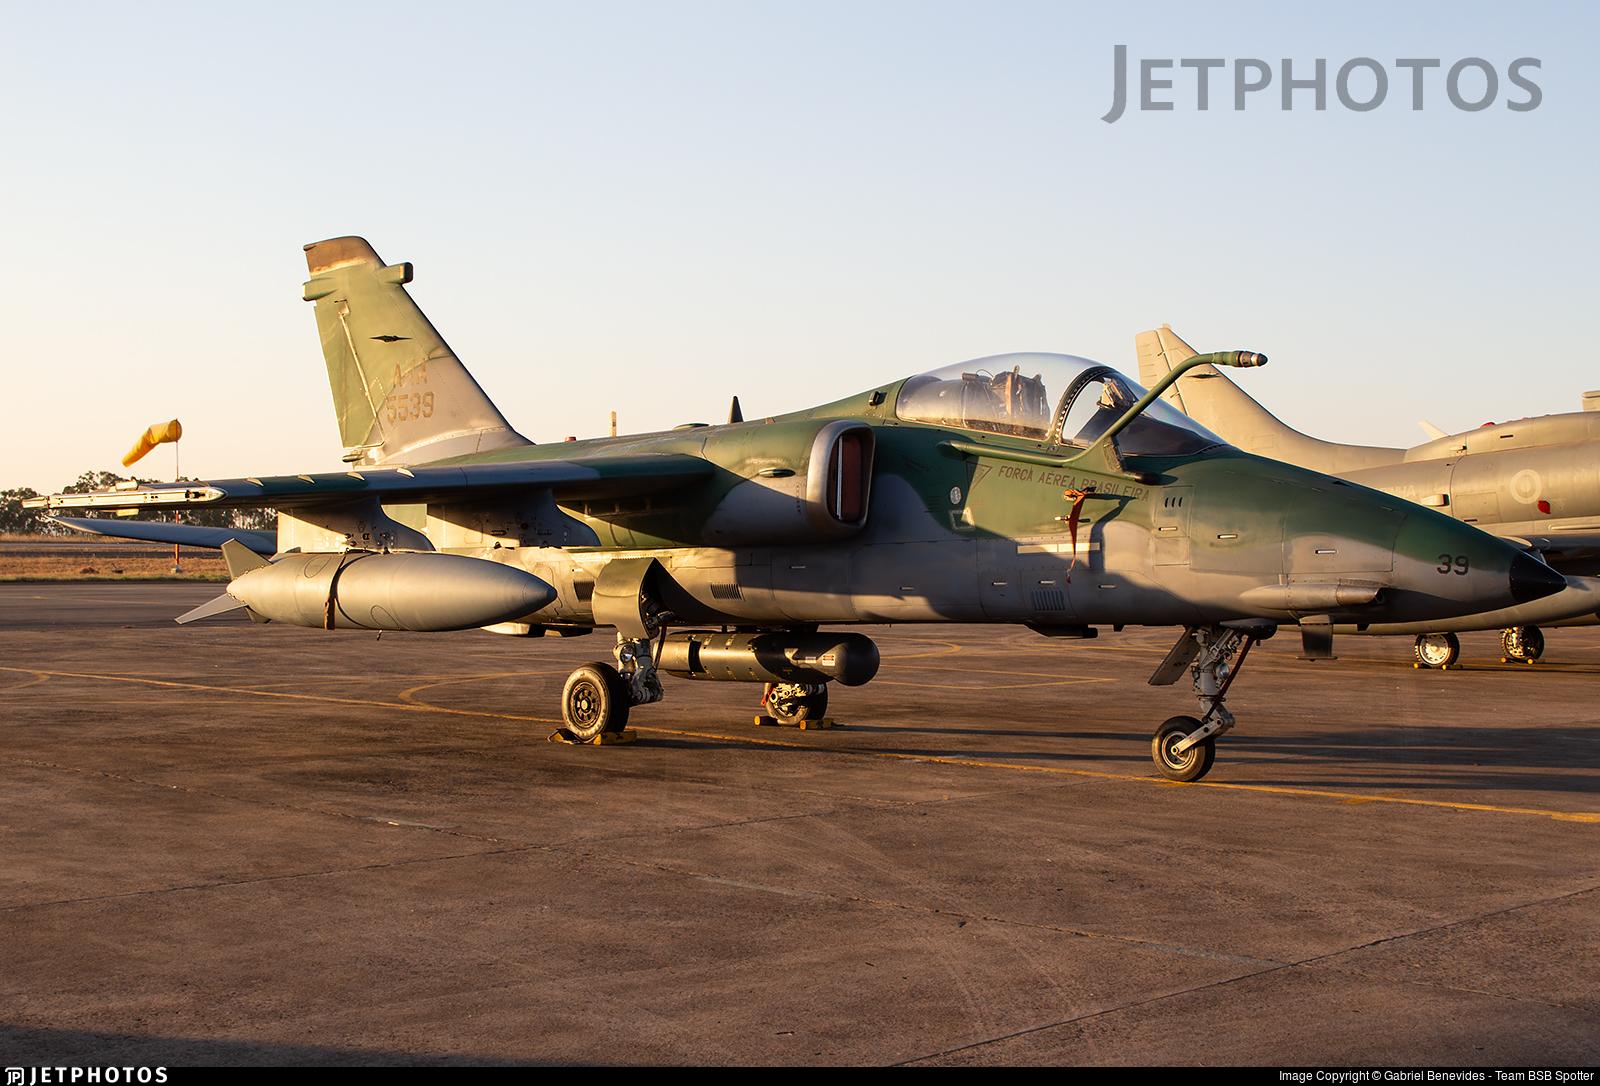 FAB5539 - Alenia/Aermacchi/Embraer A-1A - Brazil - Air Force